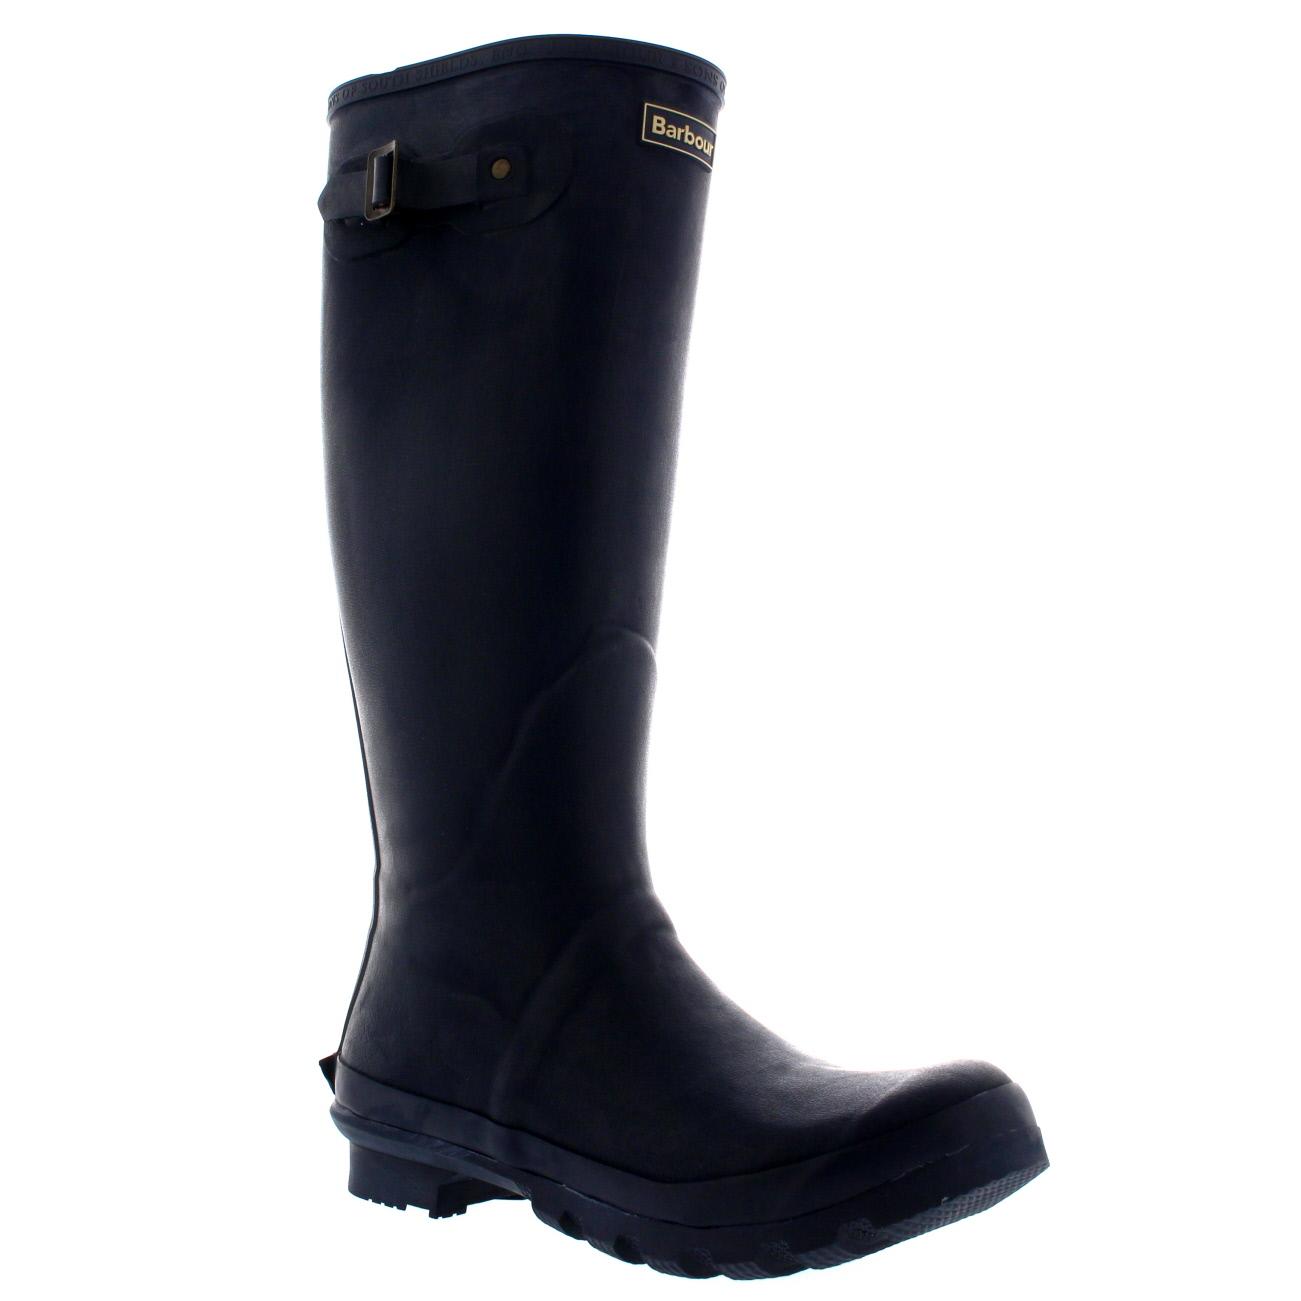 071296b7 Mens Barbour Bede Winter Mid Calf Snow Waterproof Rain Wellington Boots US 7 -14